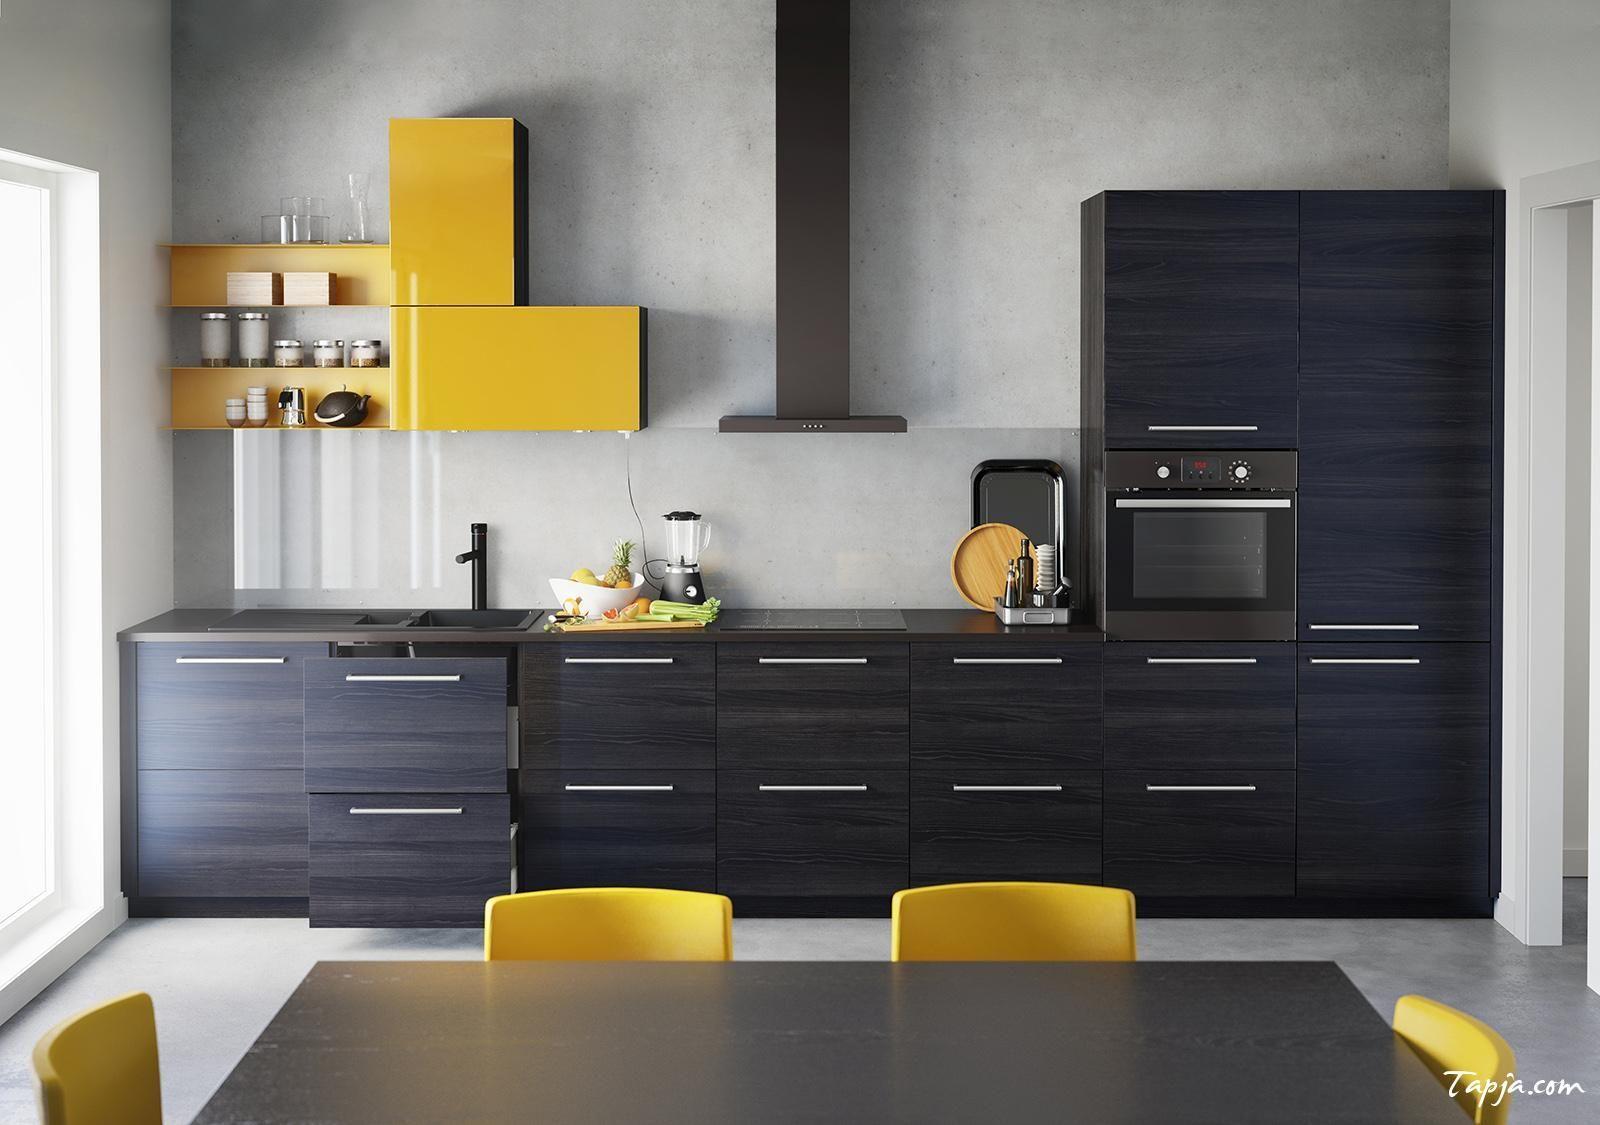 Modular Kitchens  Make Up Stylish And Versatile Kitchen Gorgeous Designs Of Modular Kitchen Photos Design Ideas